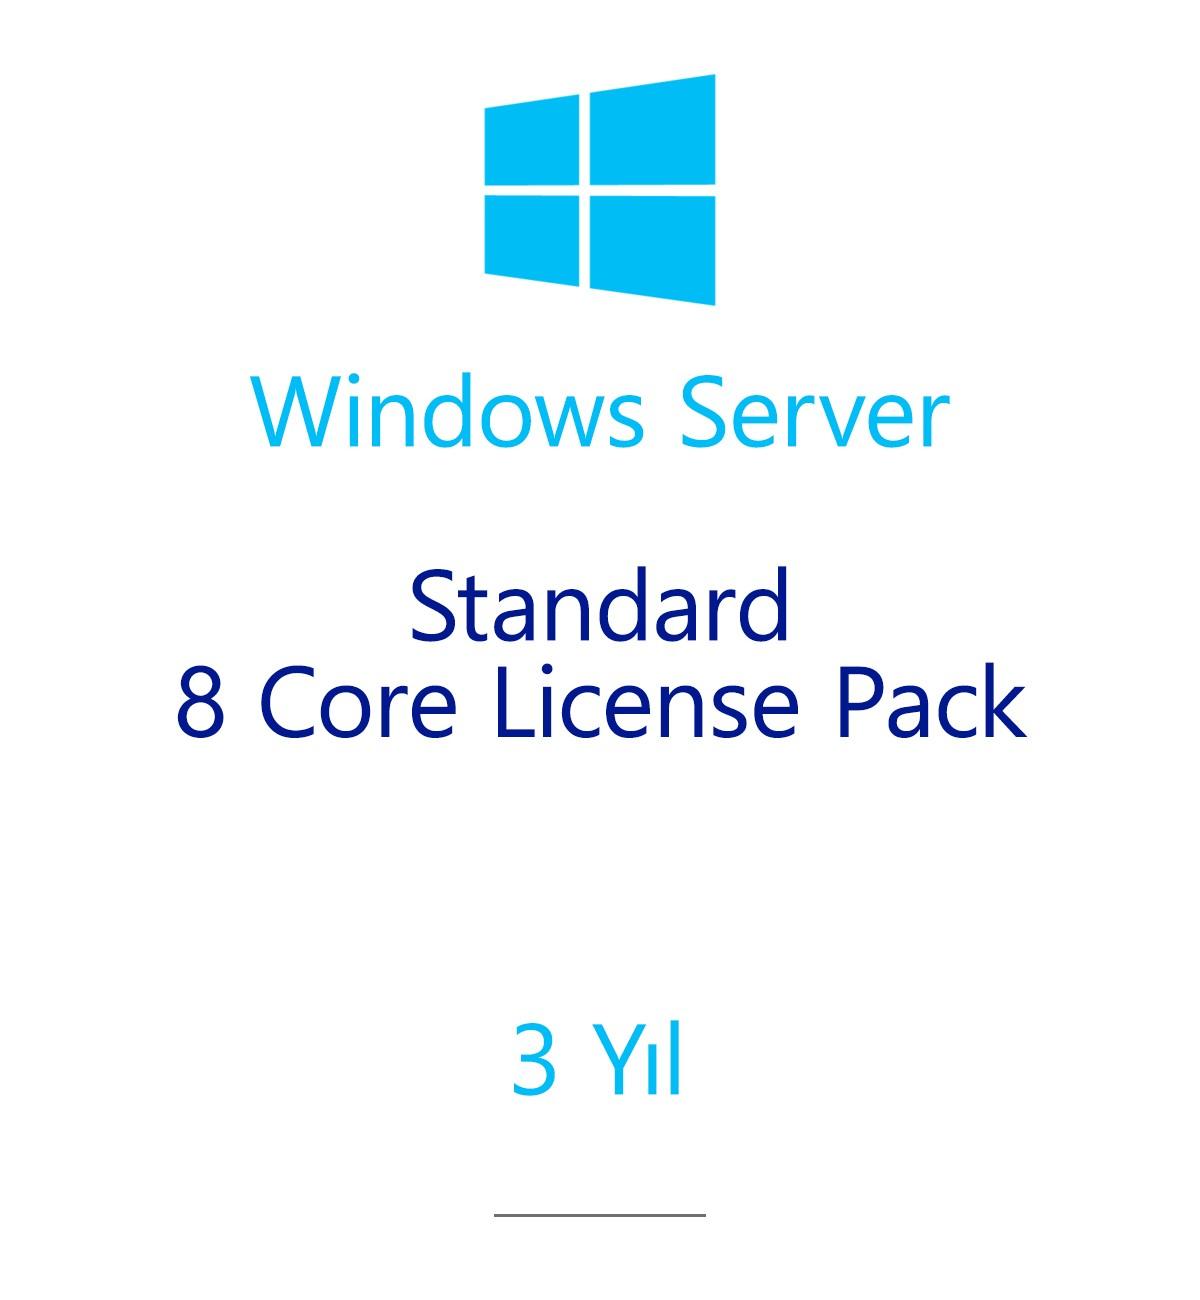 Windows Server Standard 8 Core License Pack 3 year